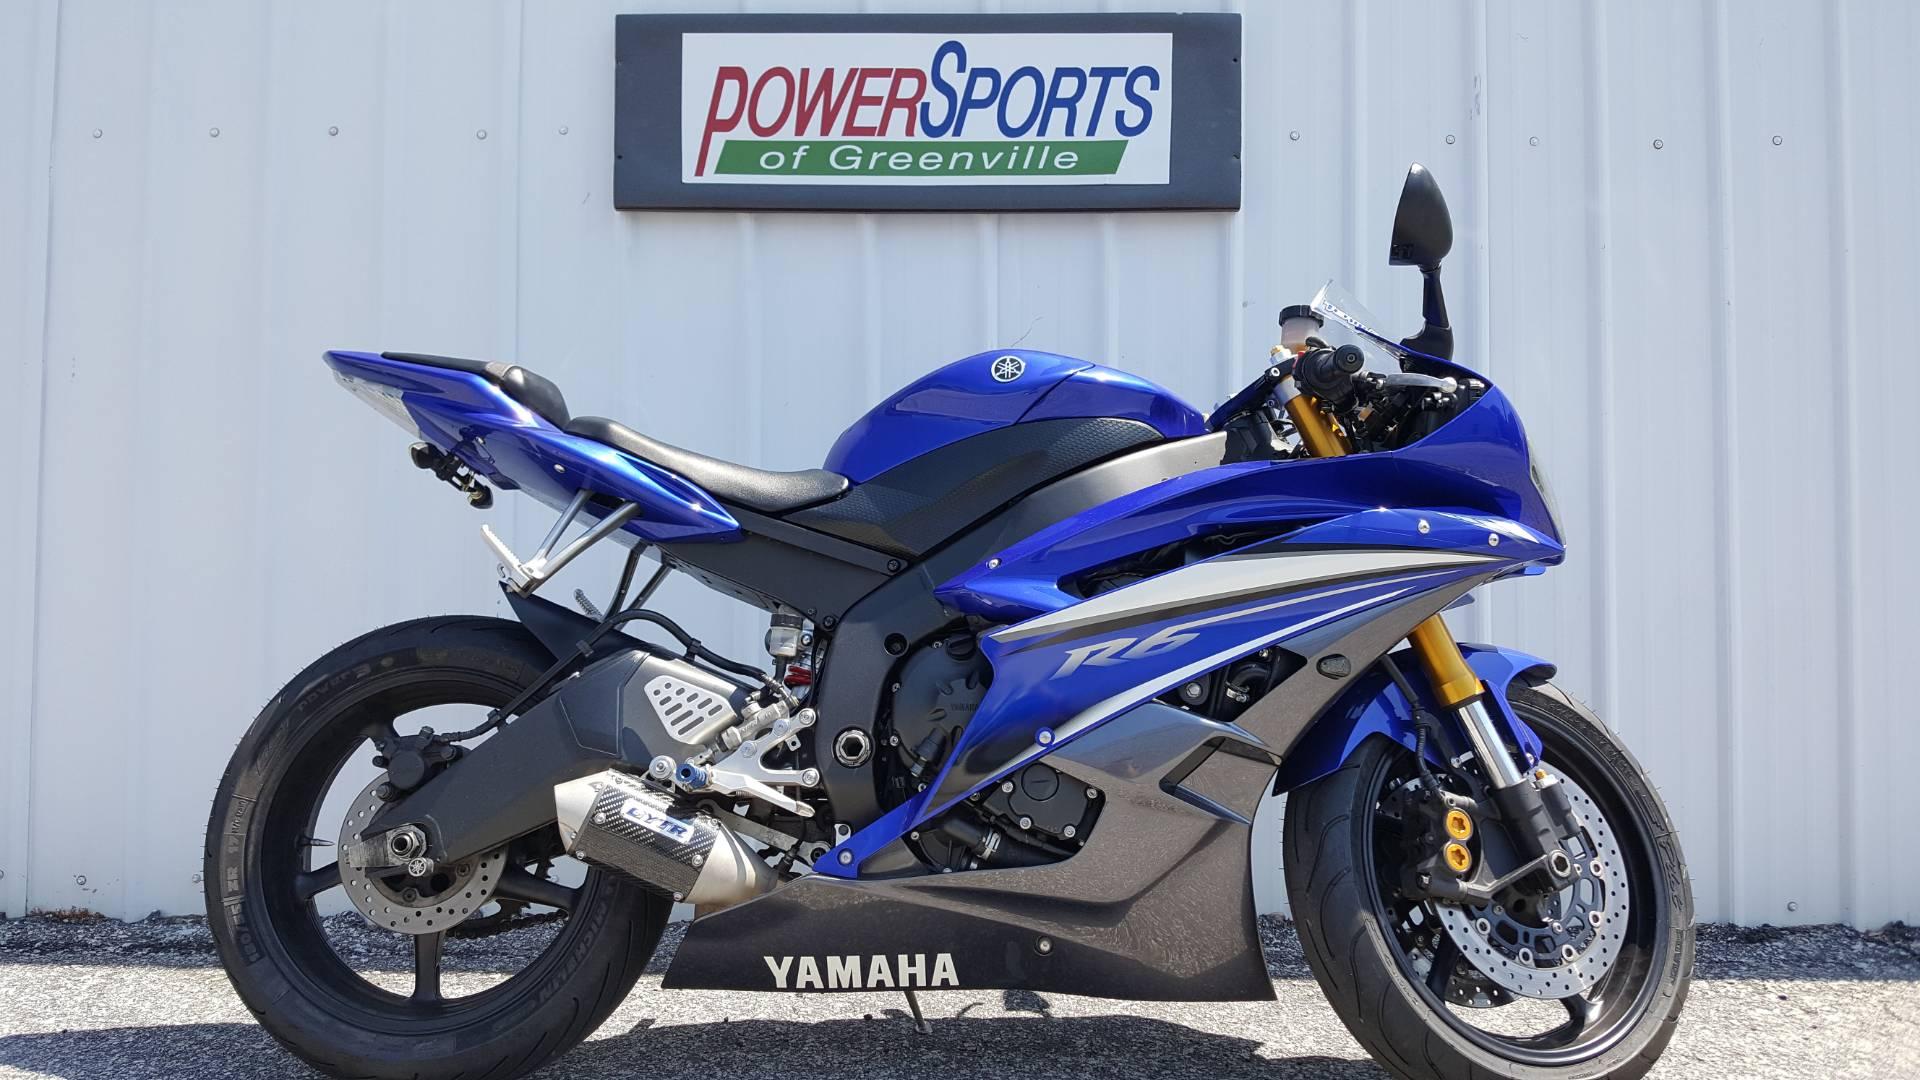 2007 Yamaha YZF-R6 for sale 157162